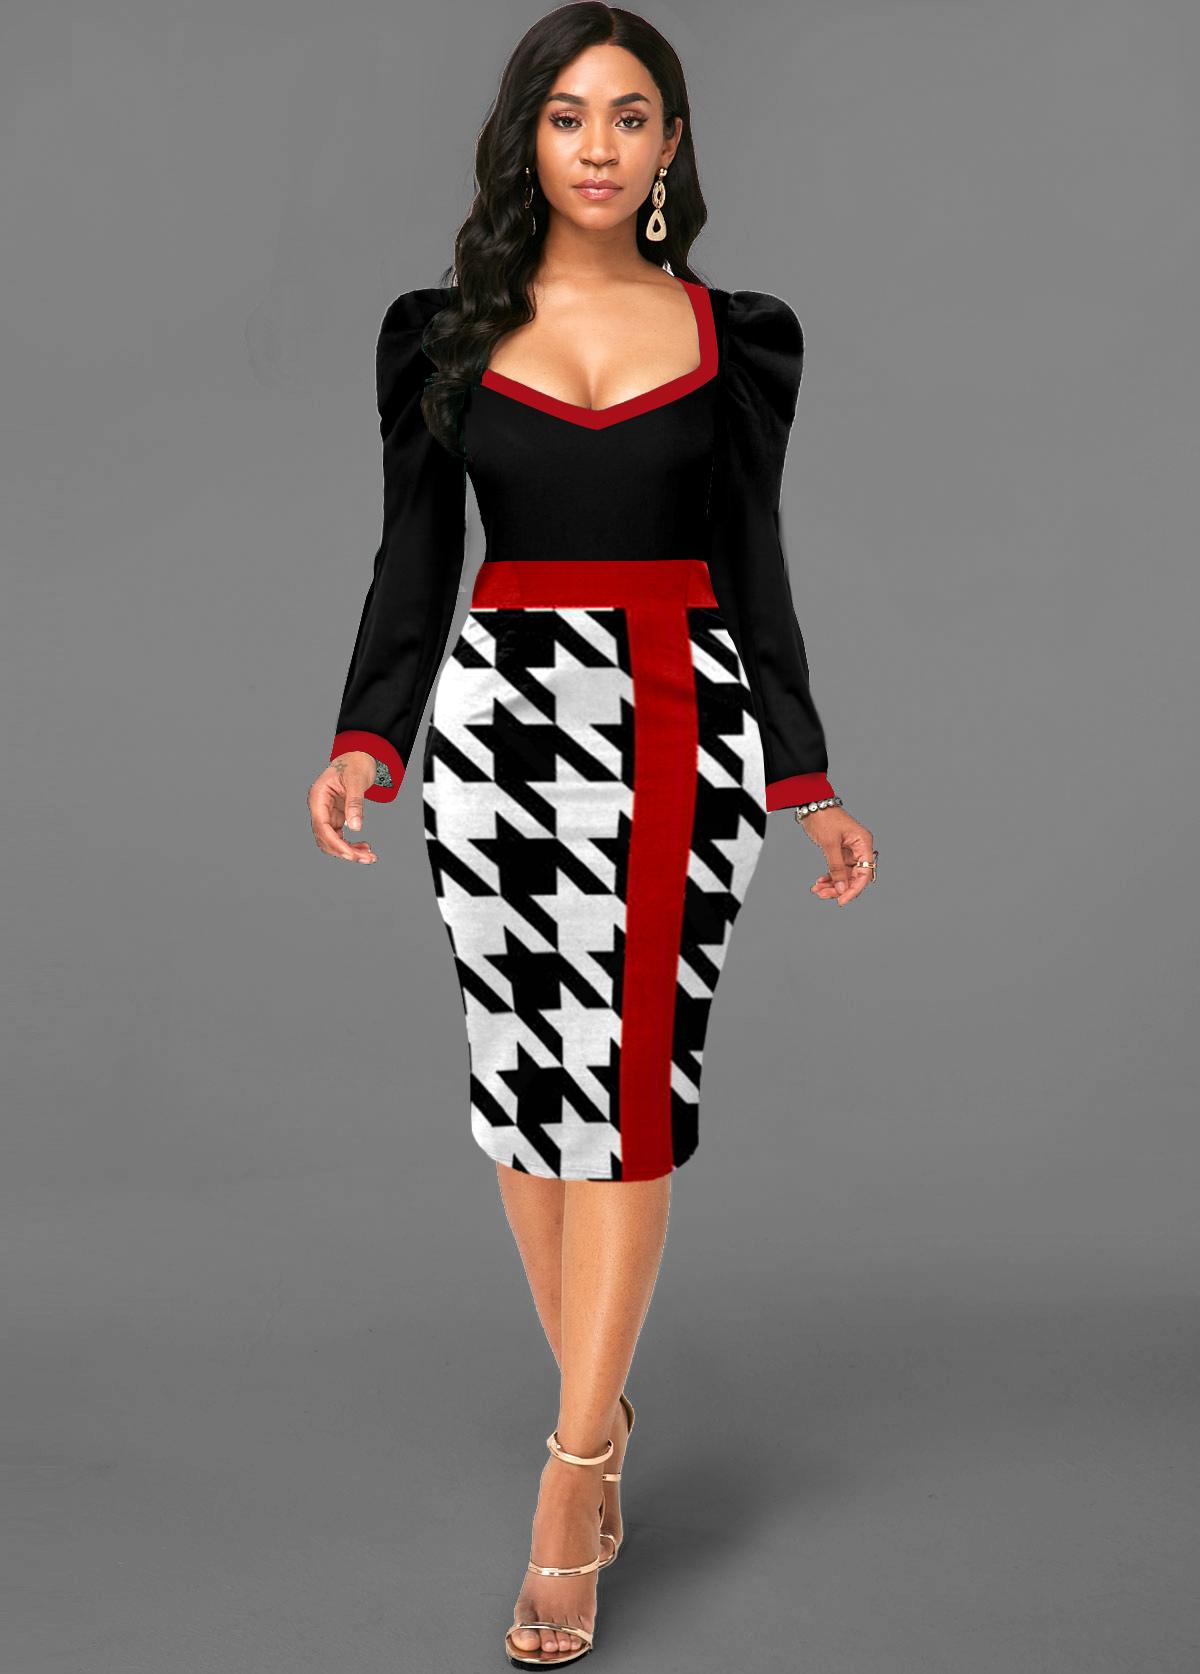 ROTITA Houndstooth Print Contrast Puff Sleeve Dress